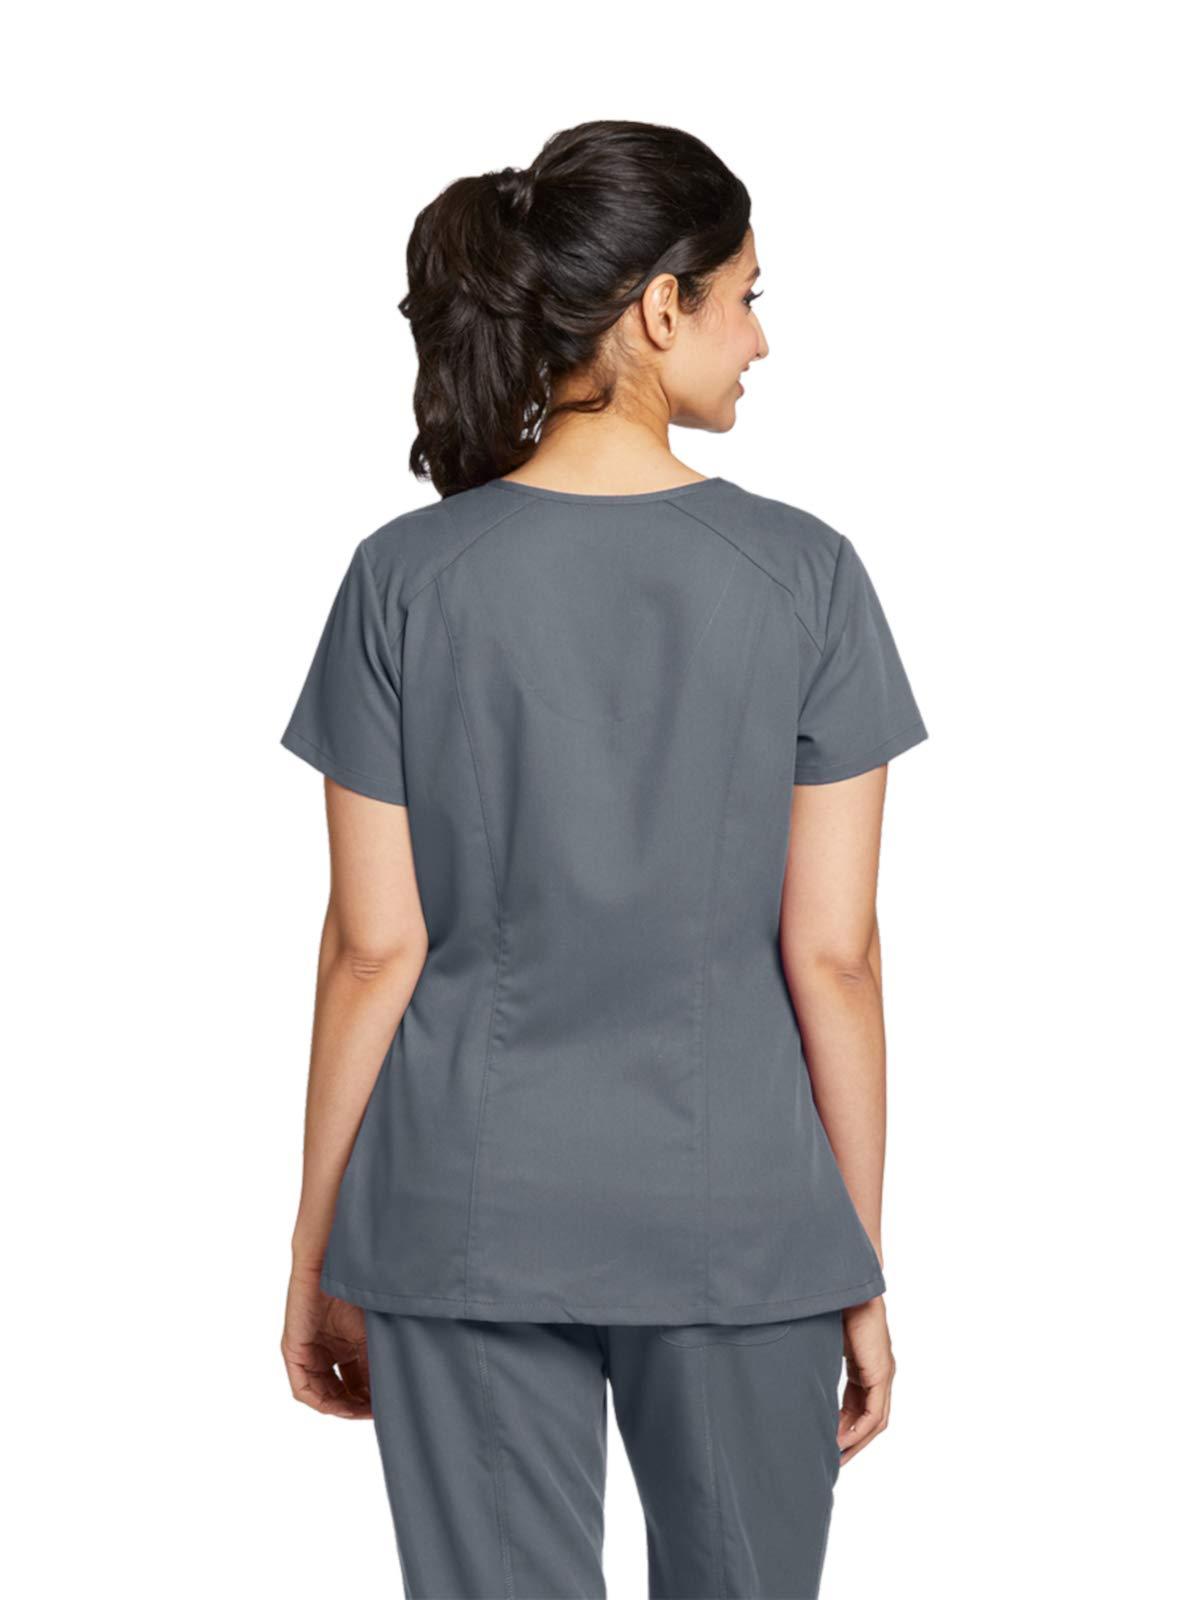 1d92d996c91 Grey's Anatomy 41452 V-Neck Top Granite 2XL - 41452X-GRANITE-2XL <  Plus-Size < Clothing, Shoes & Jewelry - tibs